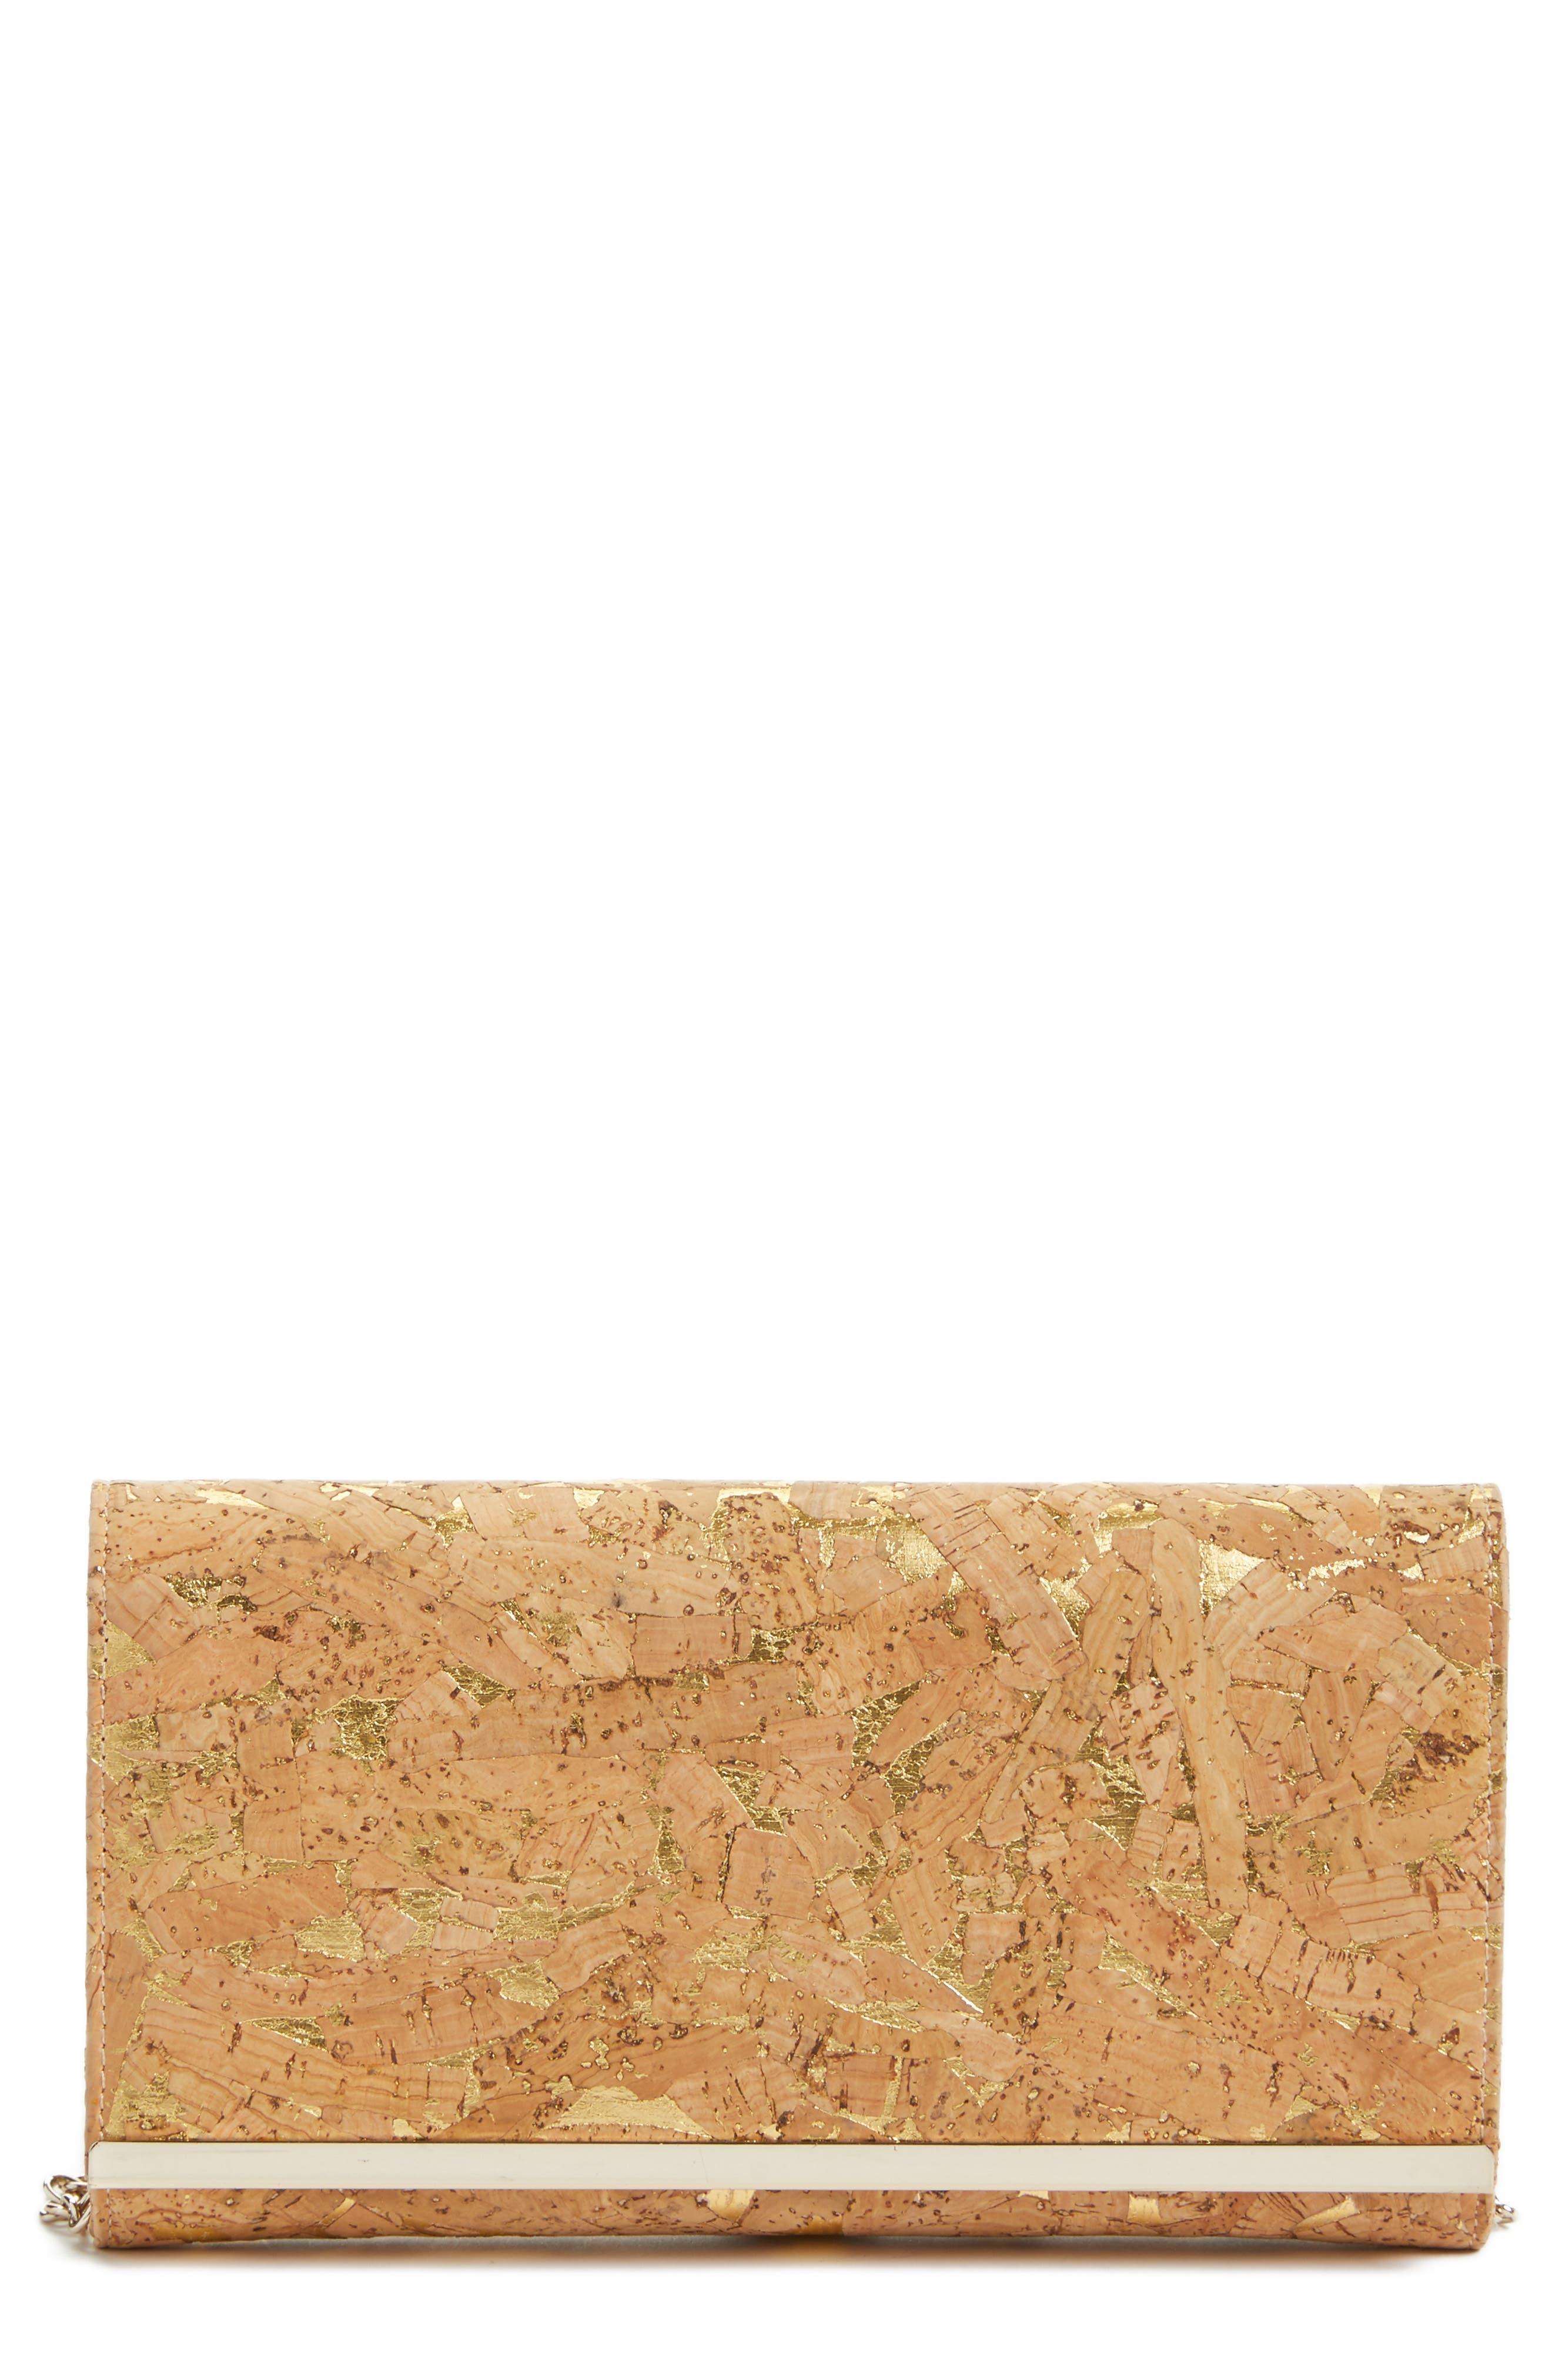 NORDSTROM Metallic Cork Clutch, Main, color, NATURAL/GOLD